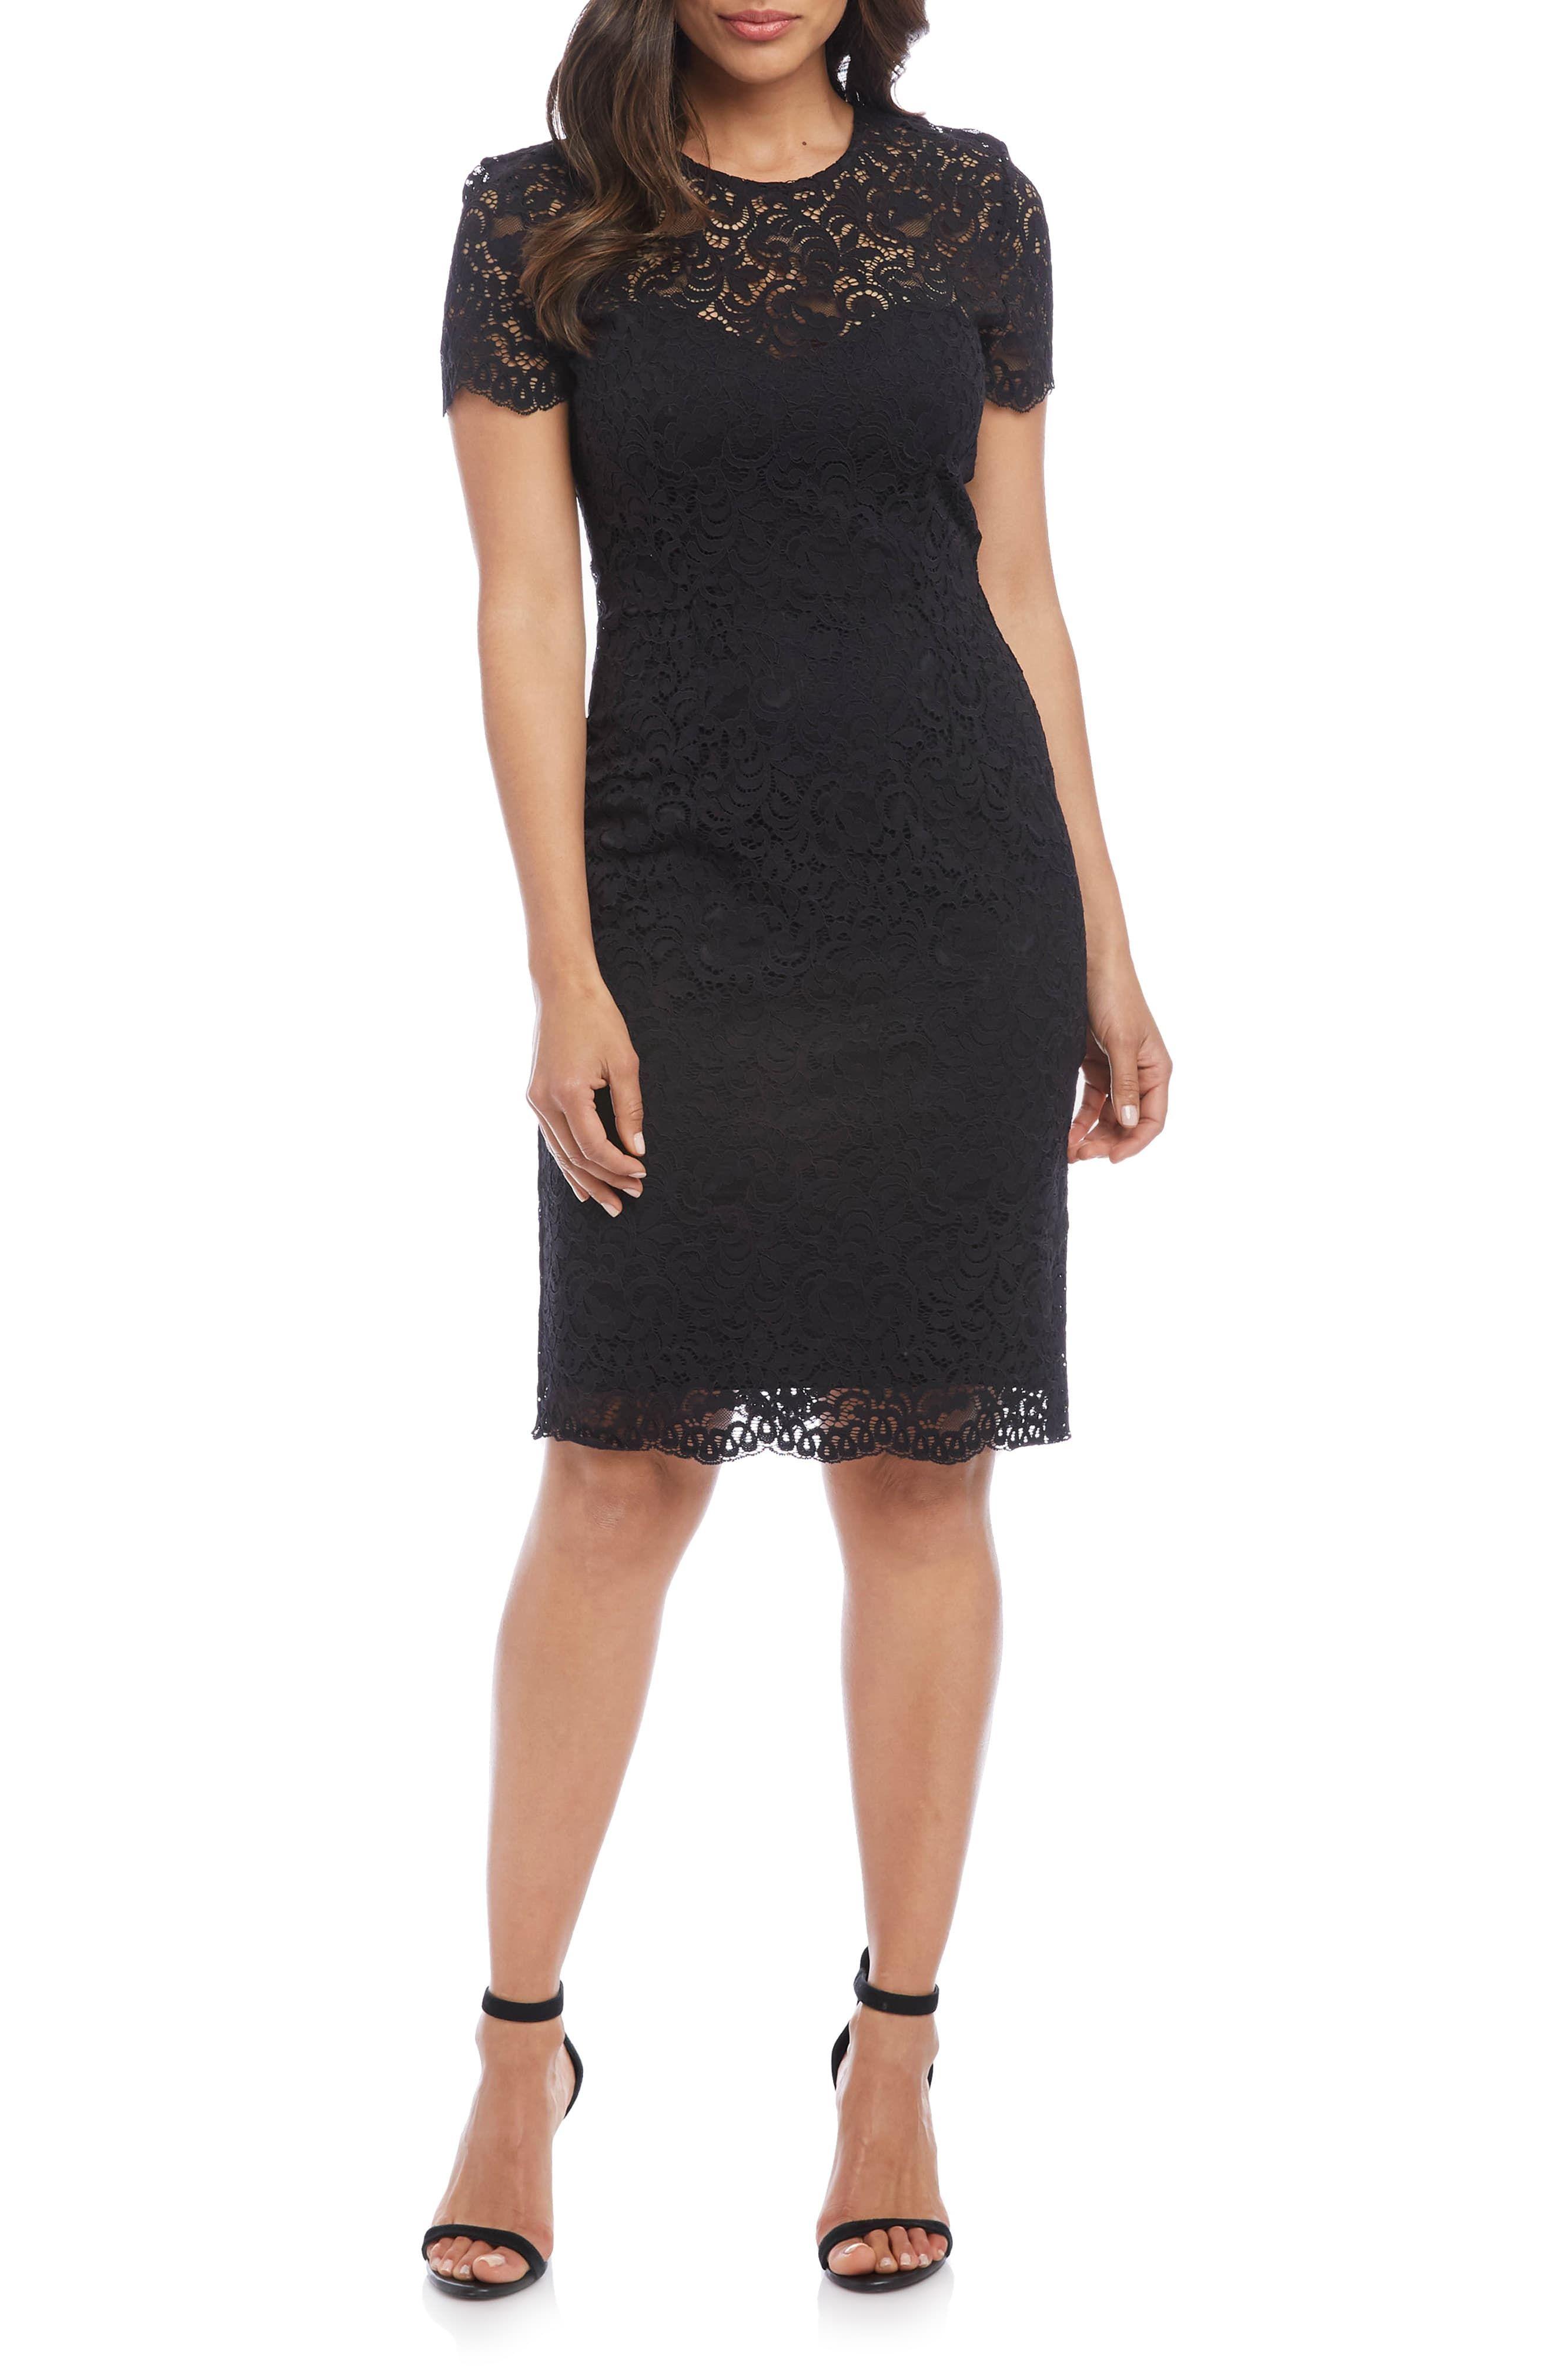 Women S Karen Kane Paris Lace Cocktail Dress Size Large Black Cocktail Dresses Online Nordstrom Dresses Online Dress Shopping [ 4048 x 2640 Pixel ]